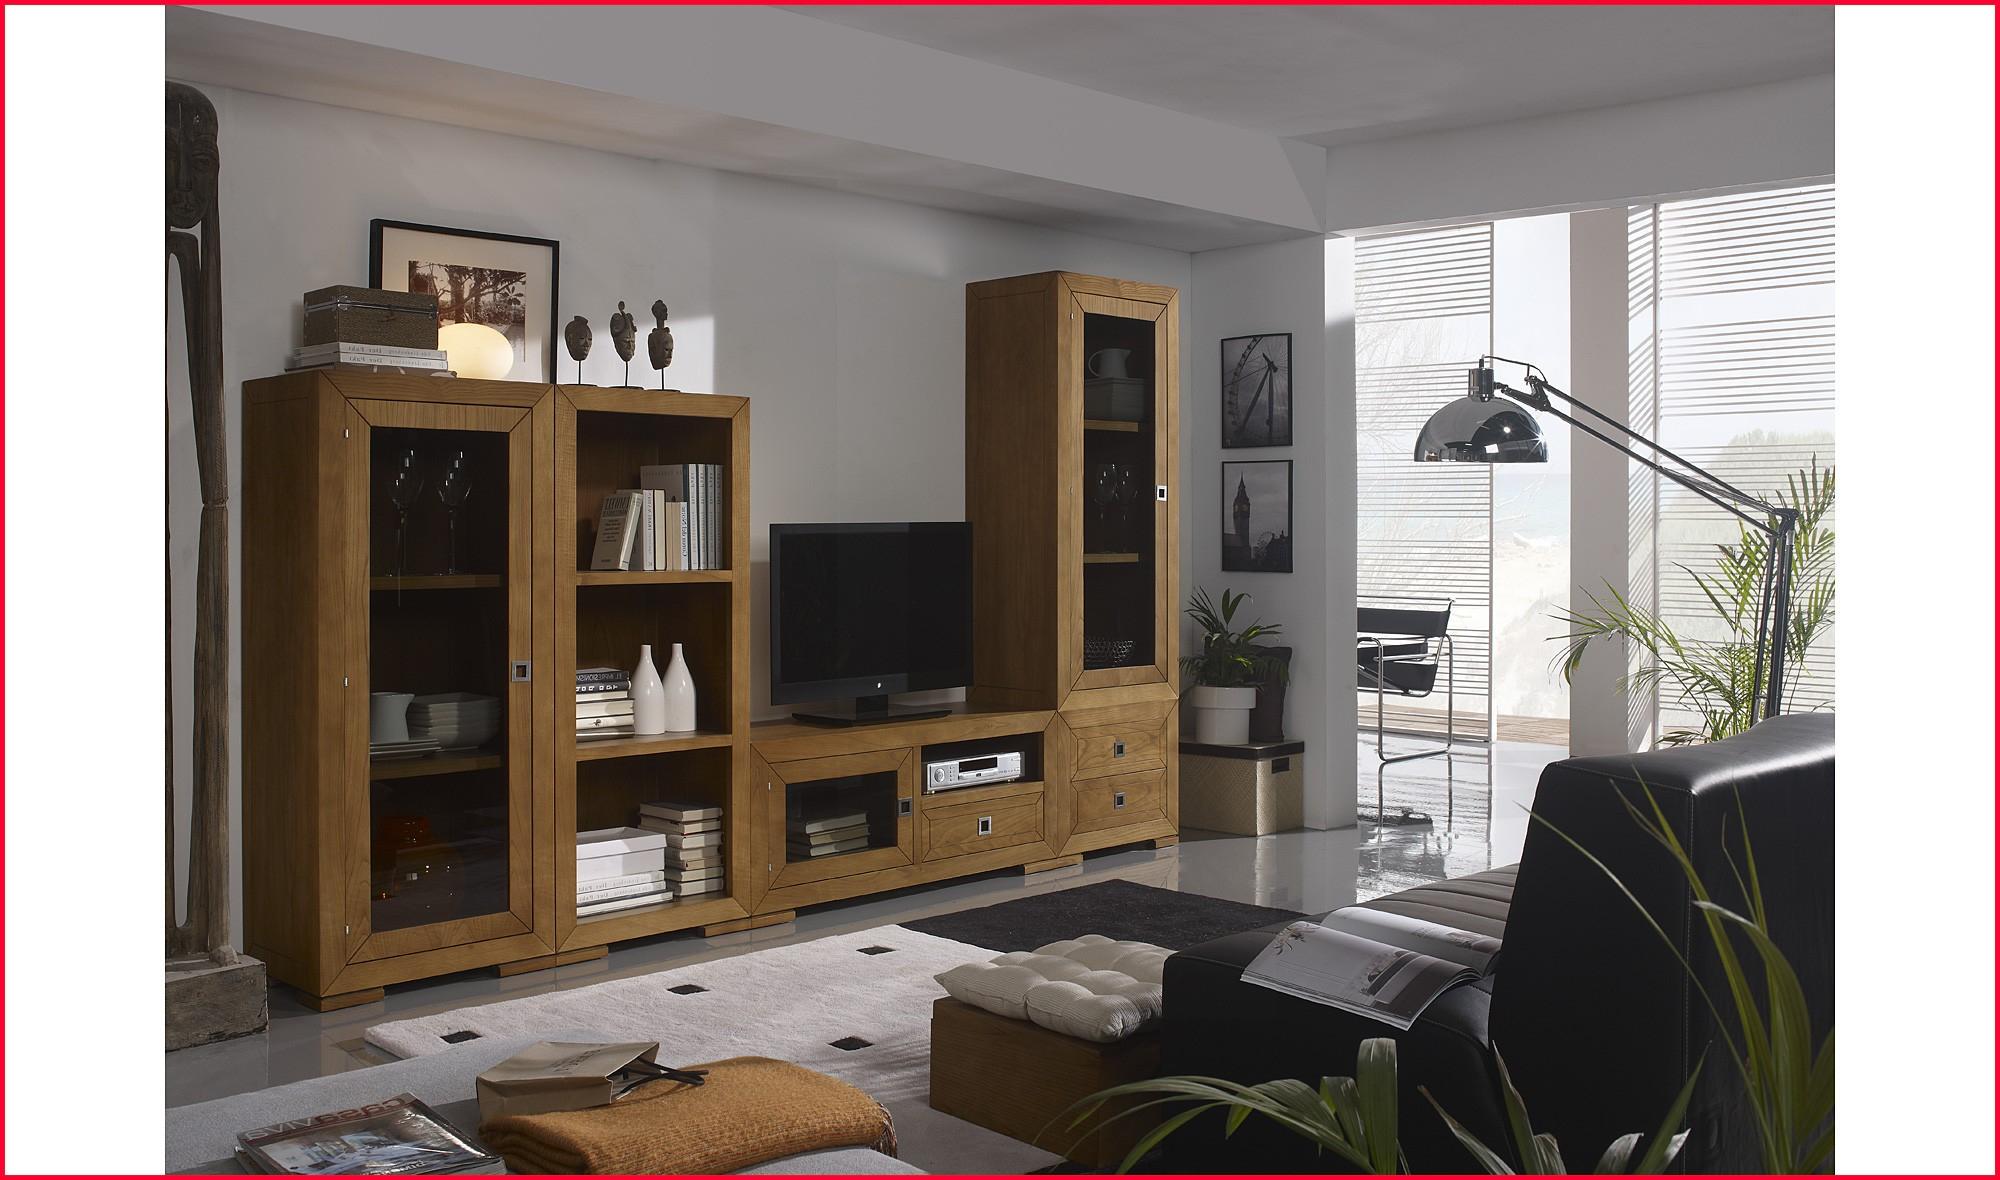 Diseño De Armarios E6d5 Armarios De Diseà O Muebles De Salon De DiseO DiseO Muebles